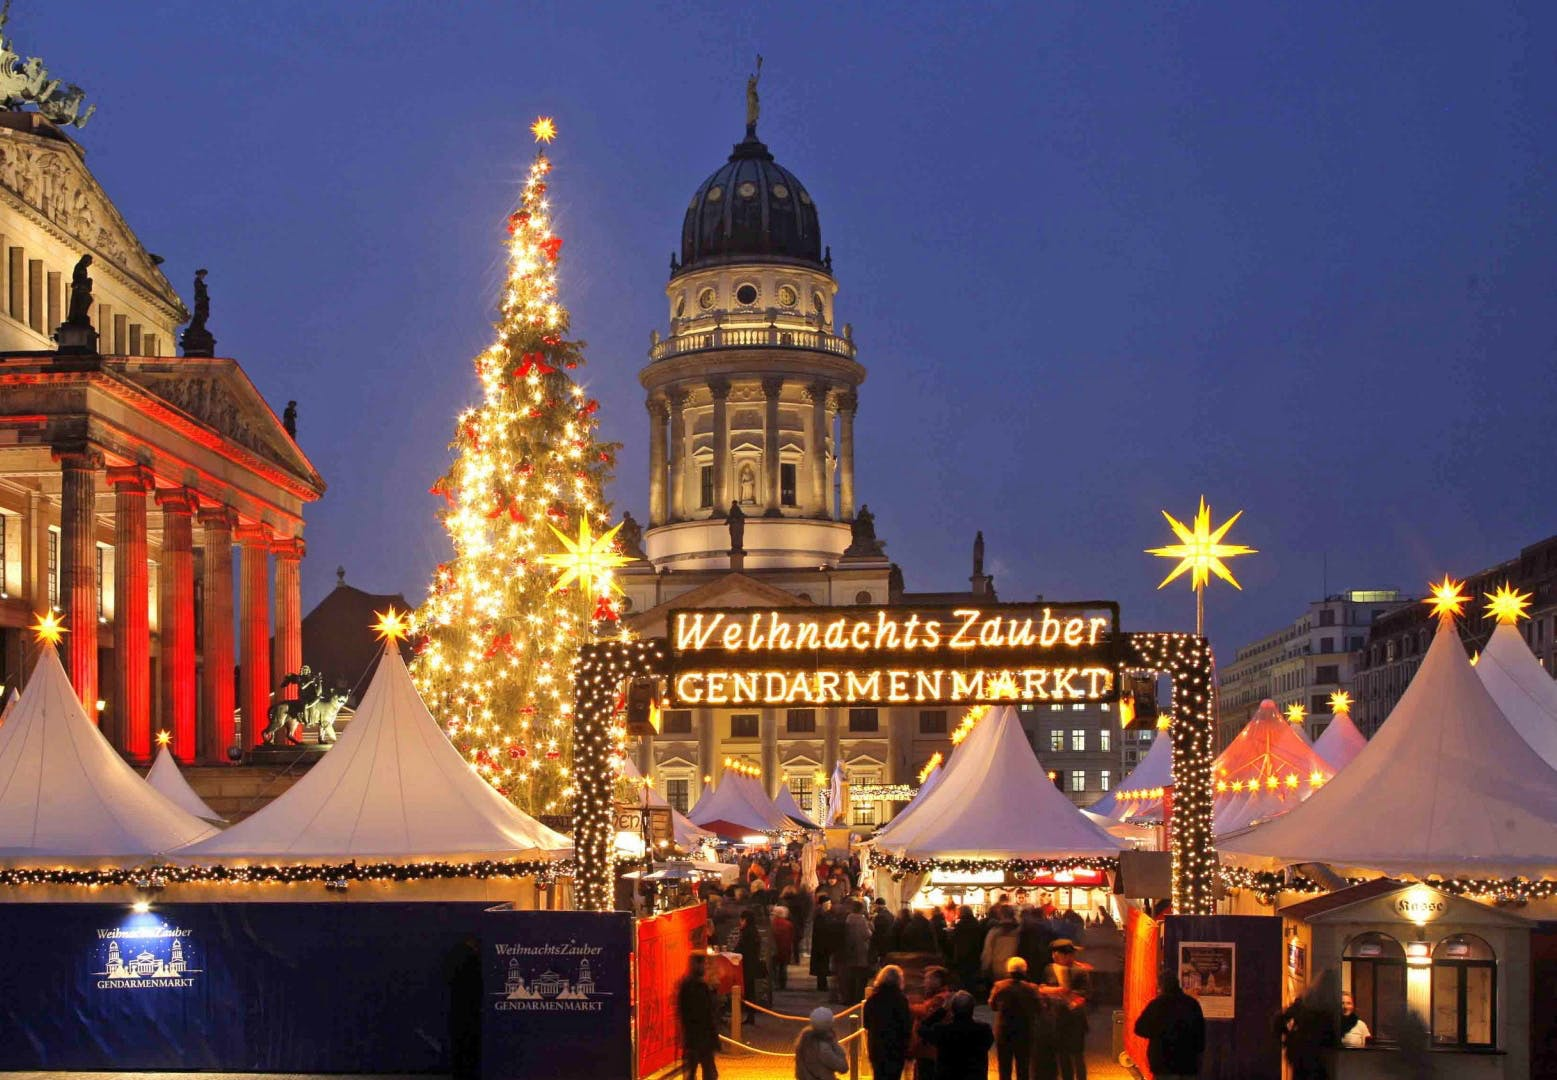 berlin juletur jul juleferie tyskland julemarked